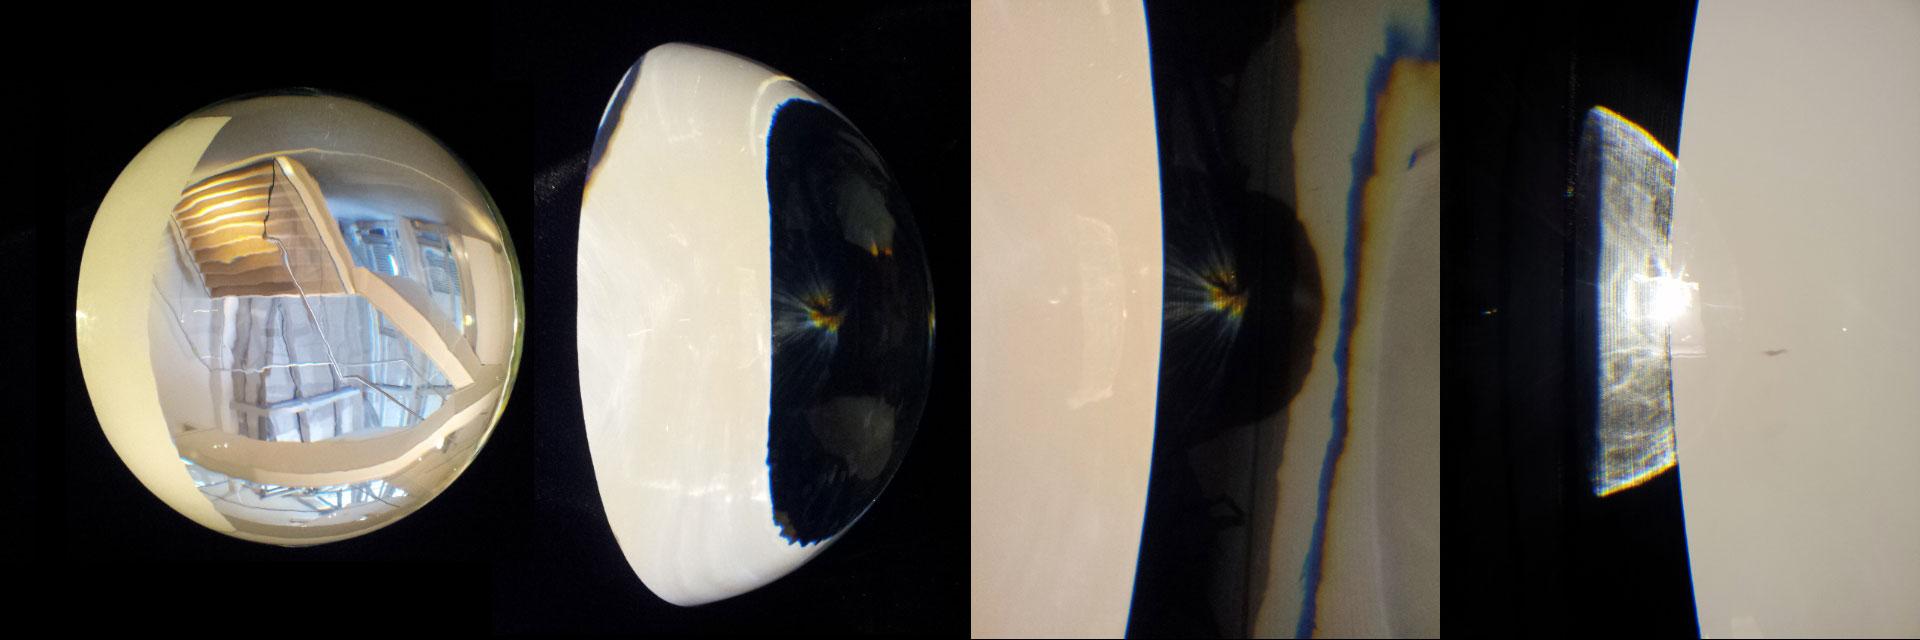 Olafur-Eliasson-Sphere-Rainbow